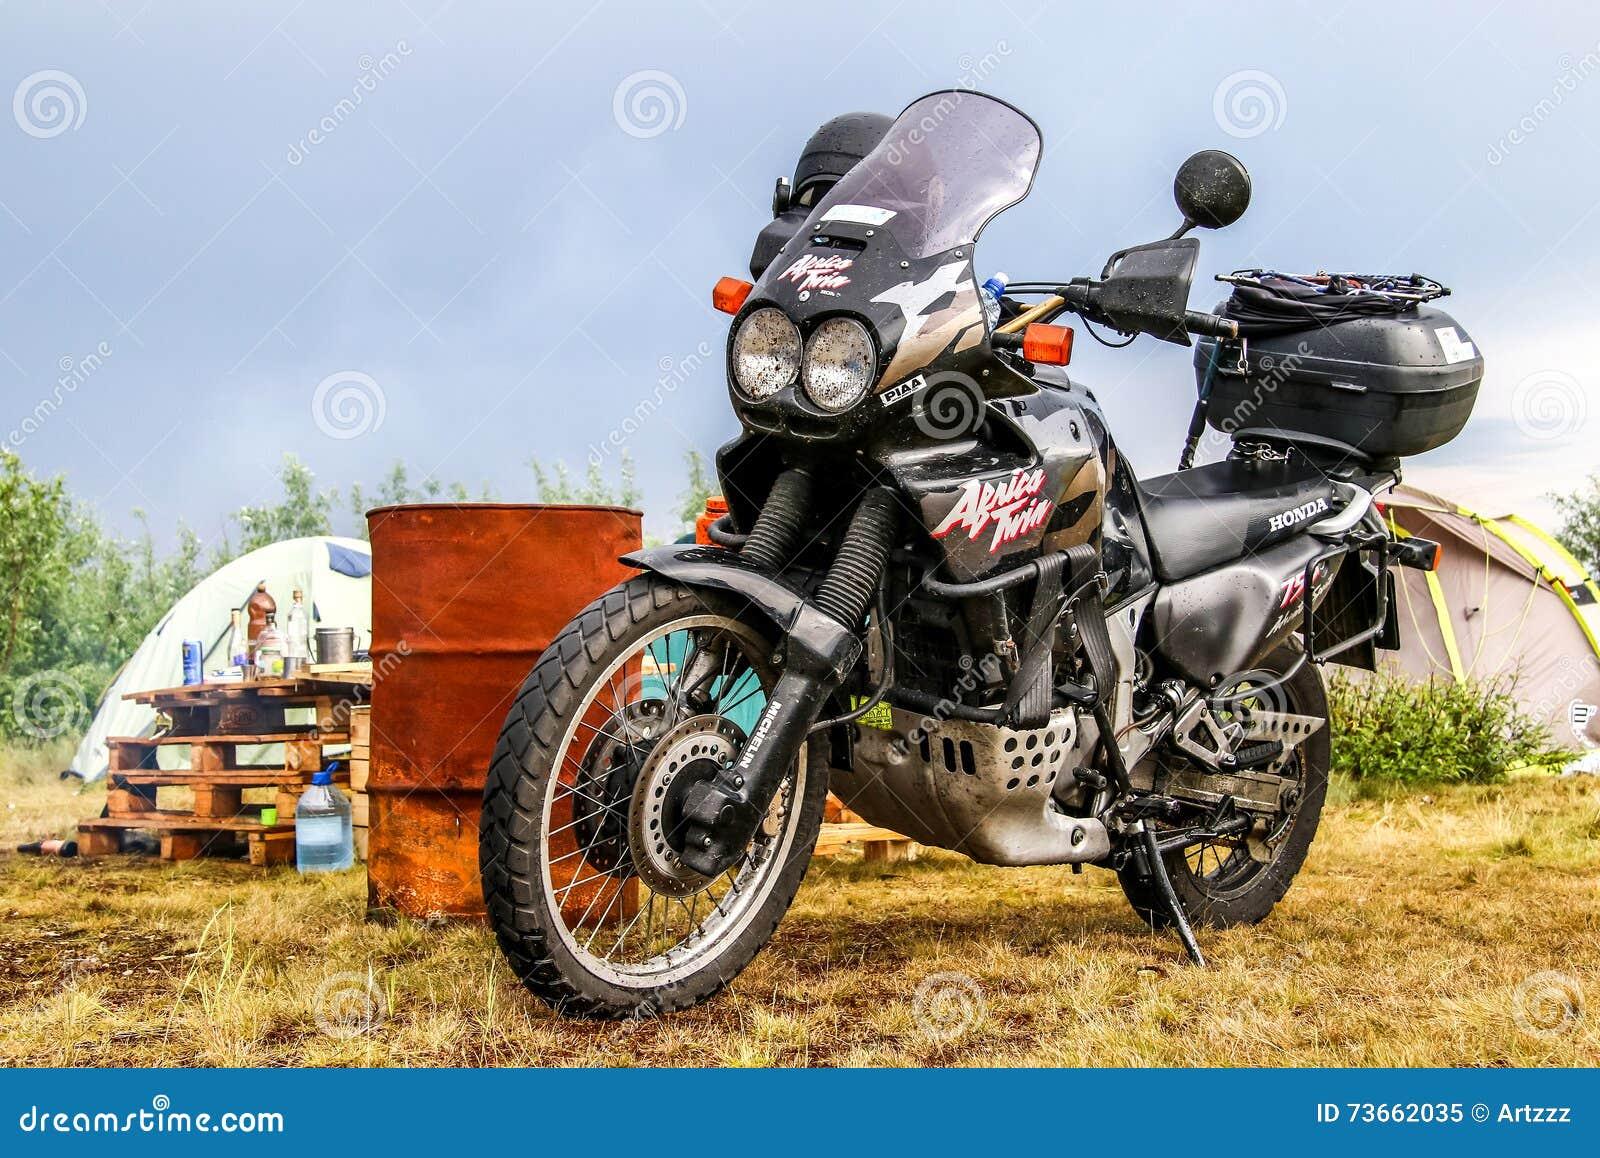 Honda Africa Twin 750 Editorial Image Image Of Bike 73662035